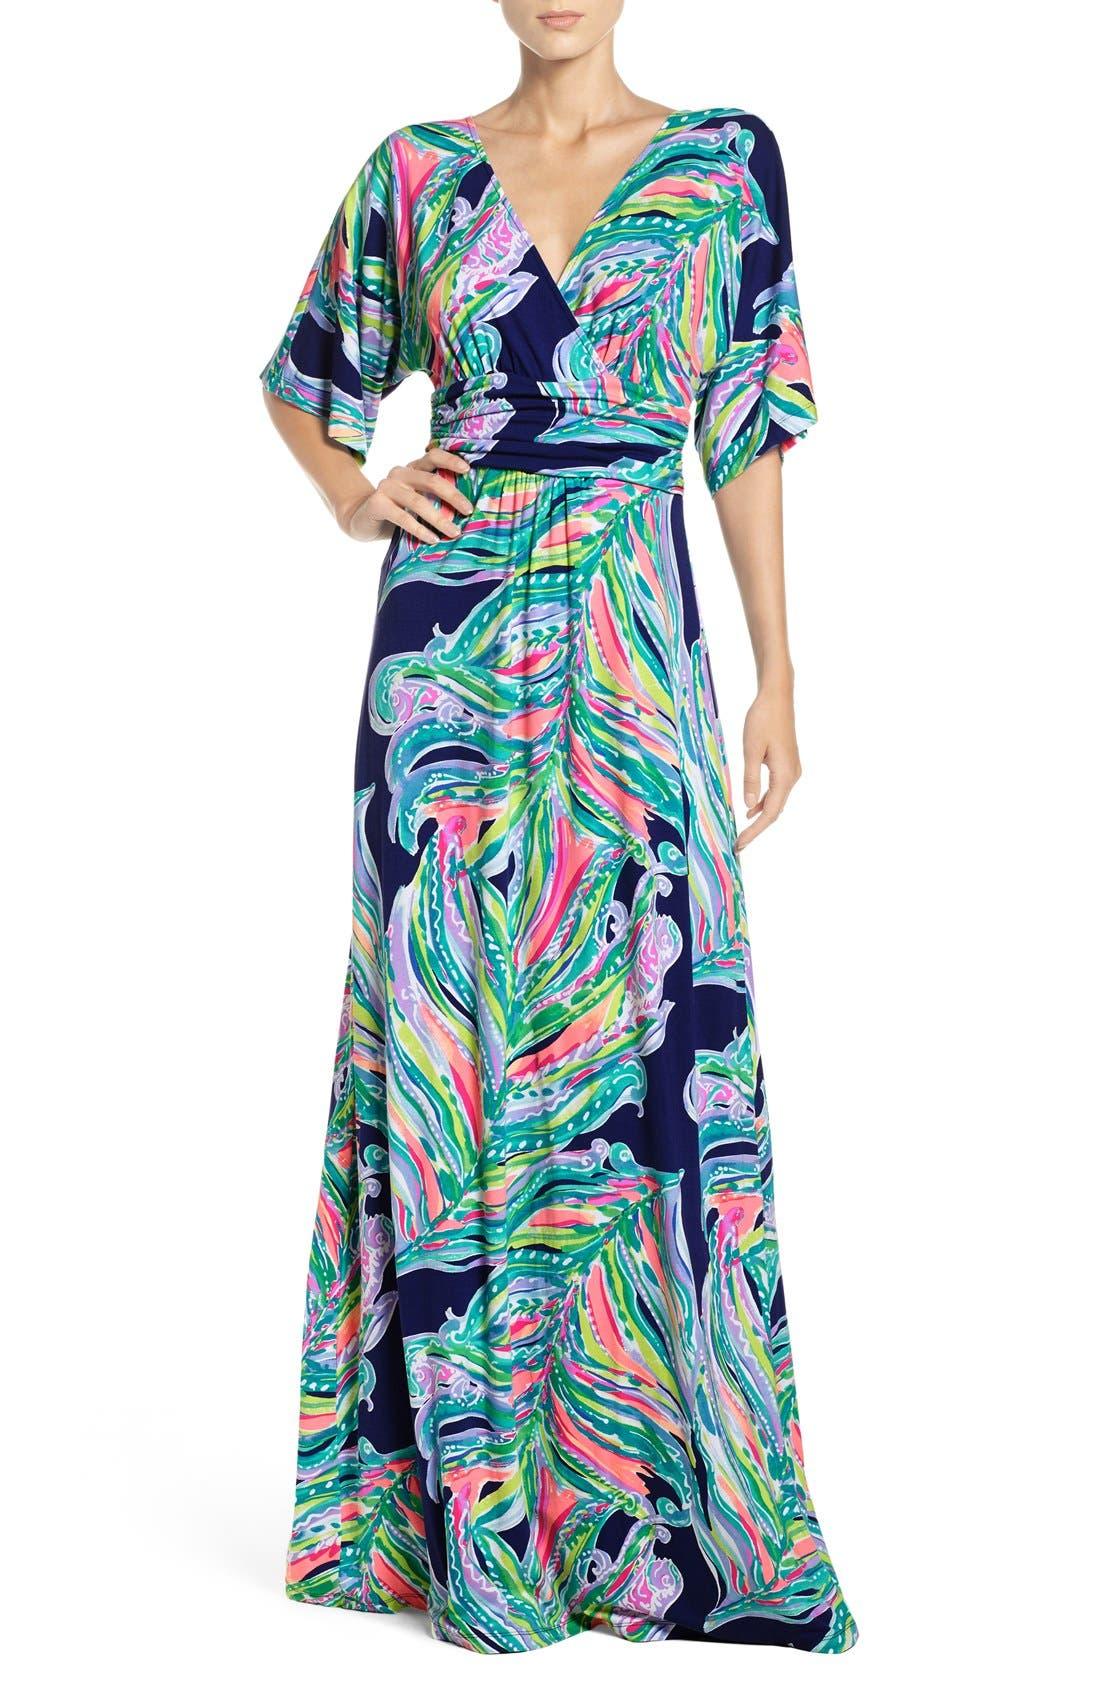 Main Image - Lilly Pulitzer® Parigi Maxi Dress